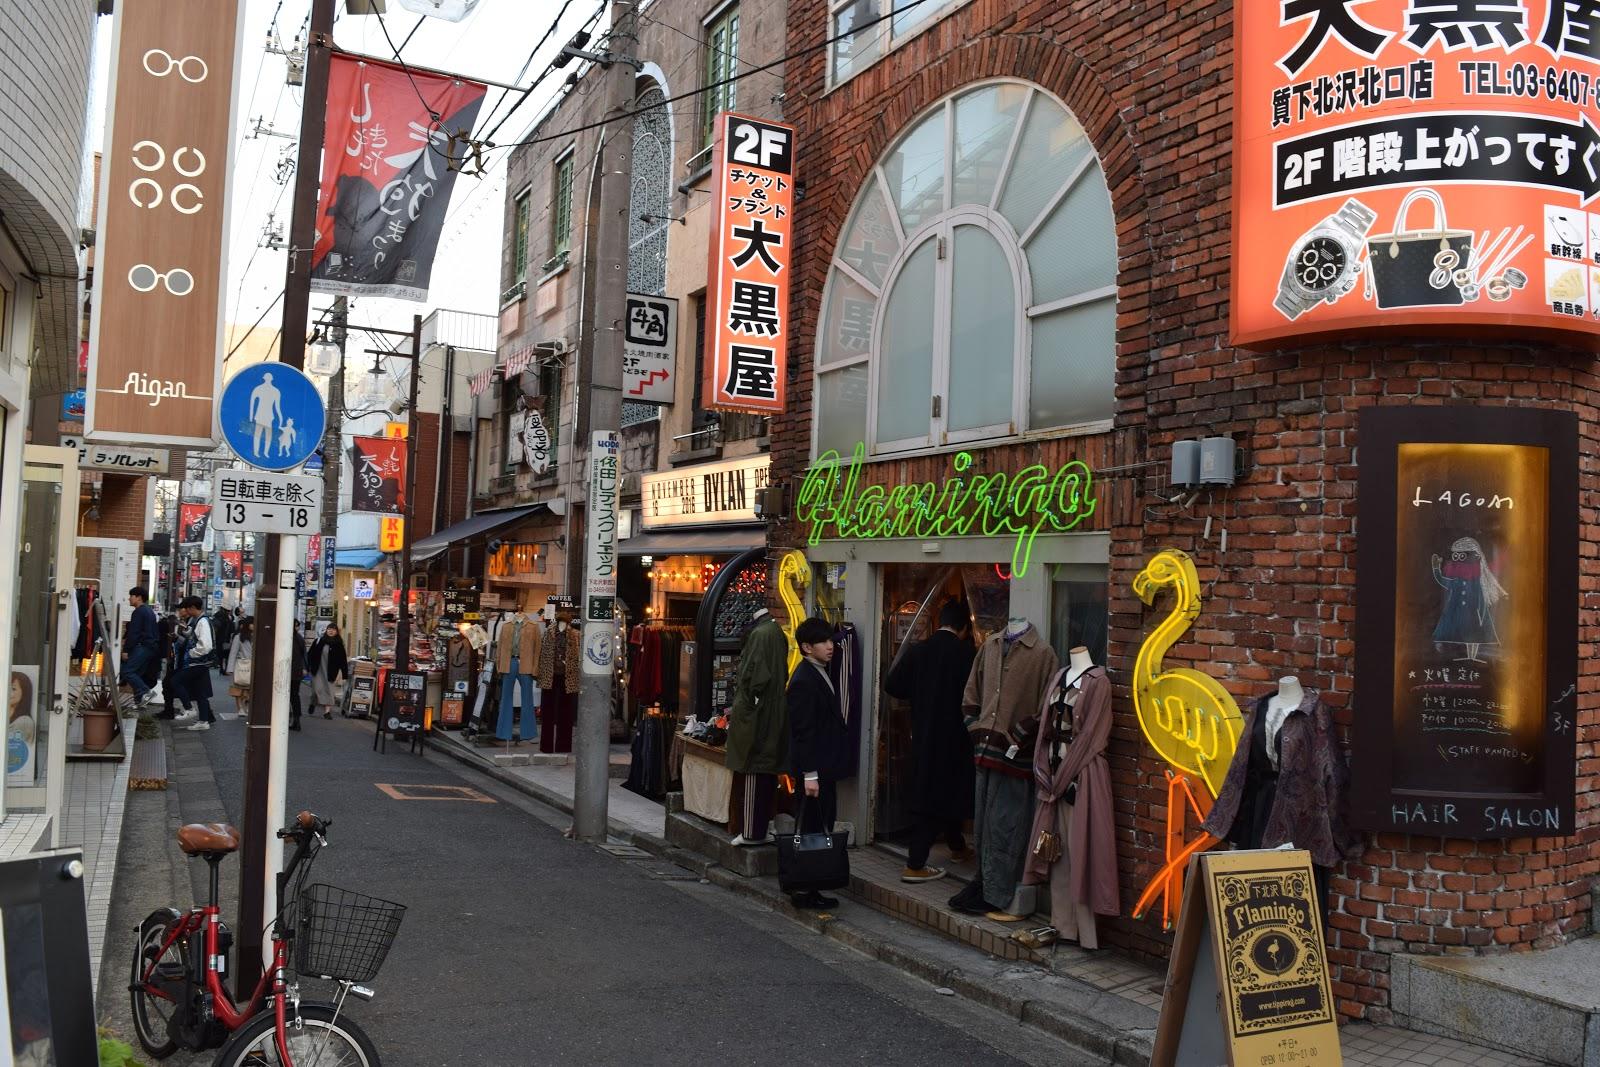 Flamingo vintage clothes store in Shimokitazawa Tokyo